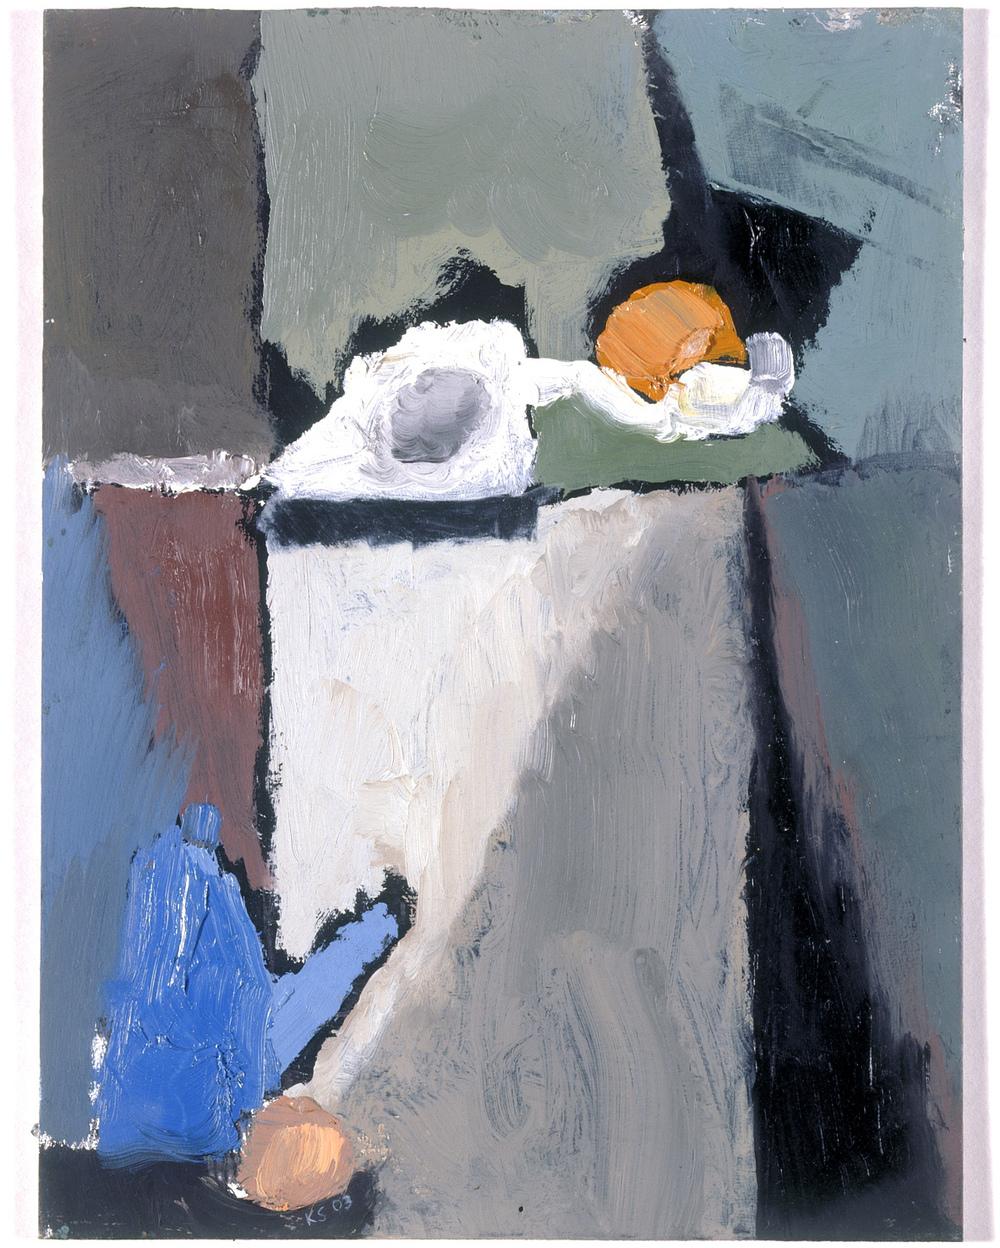 Kitty Stirling|Still Life on Black I, 2003| Oil on board| 25 x 19 cms.jpg